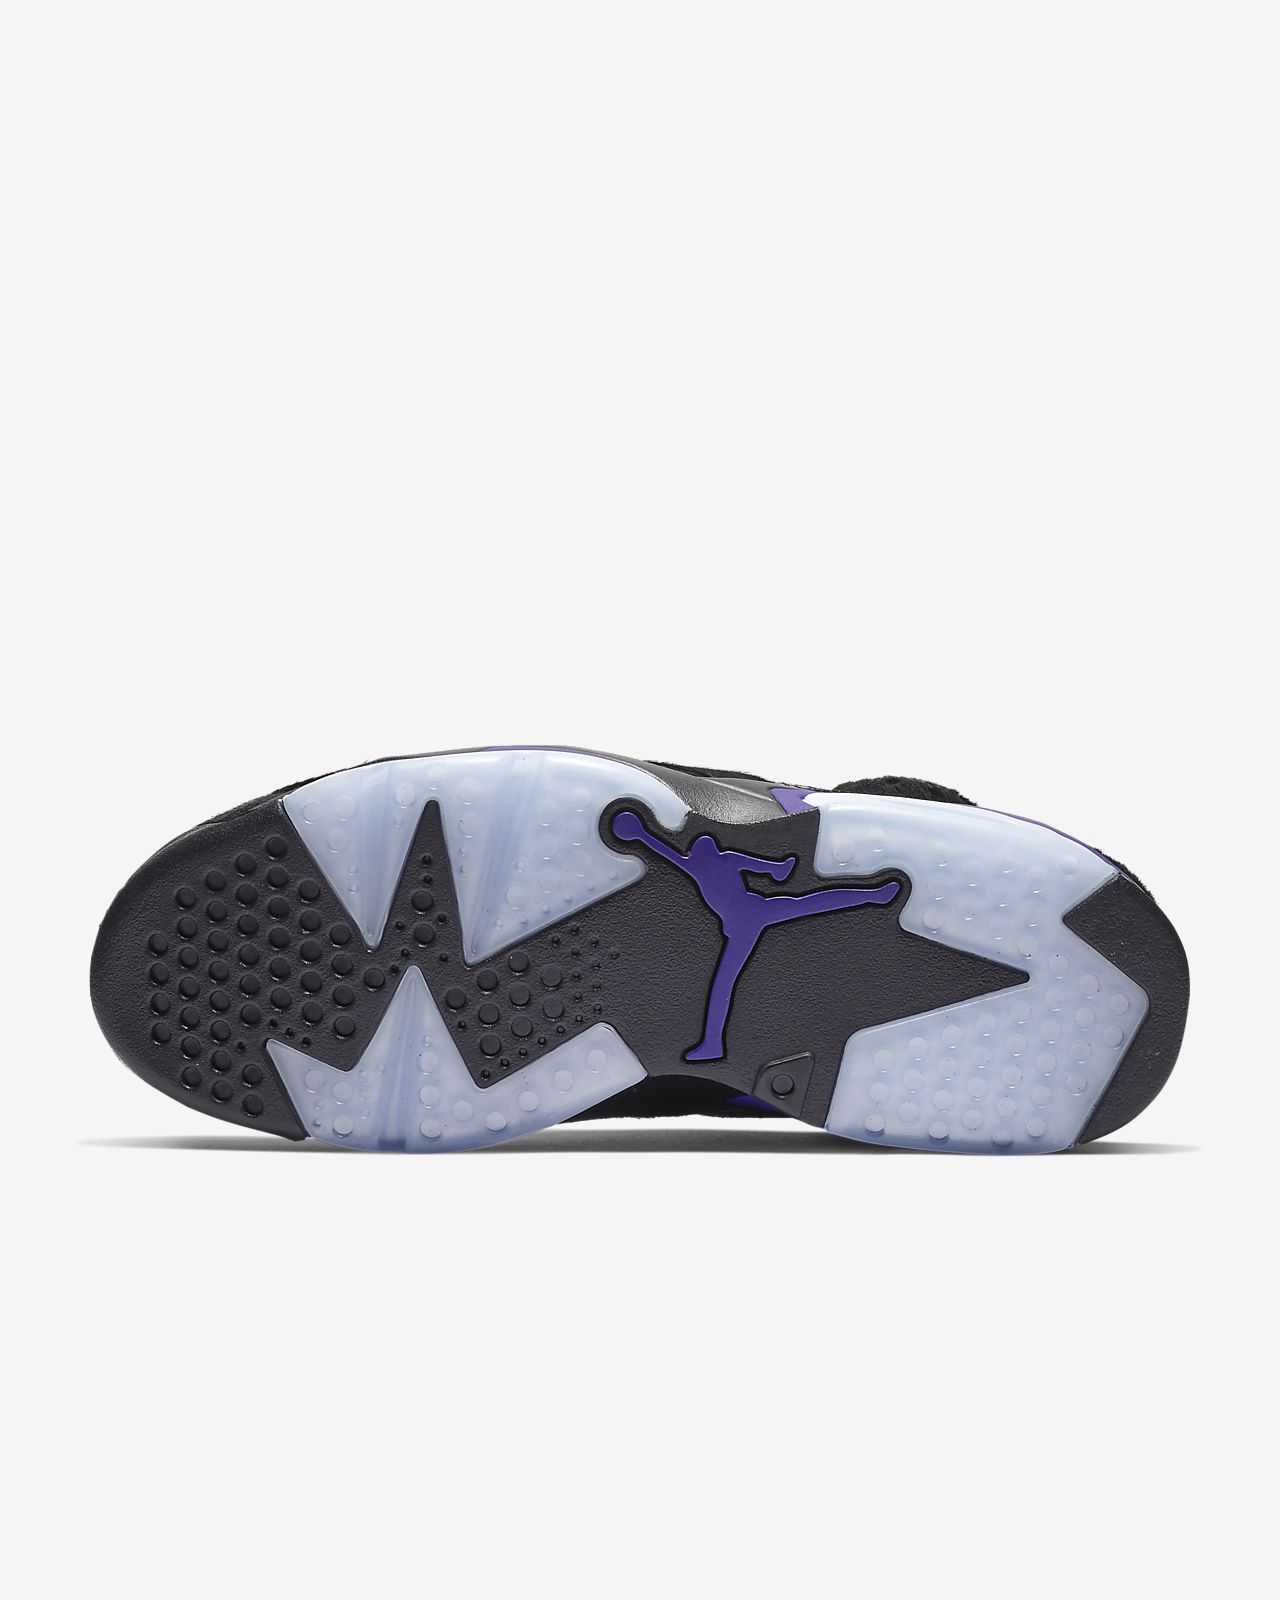 5a008d73c133af Sko Air Jordan 6 Retro för män. Nike.com SE